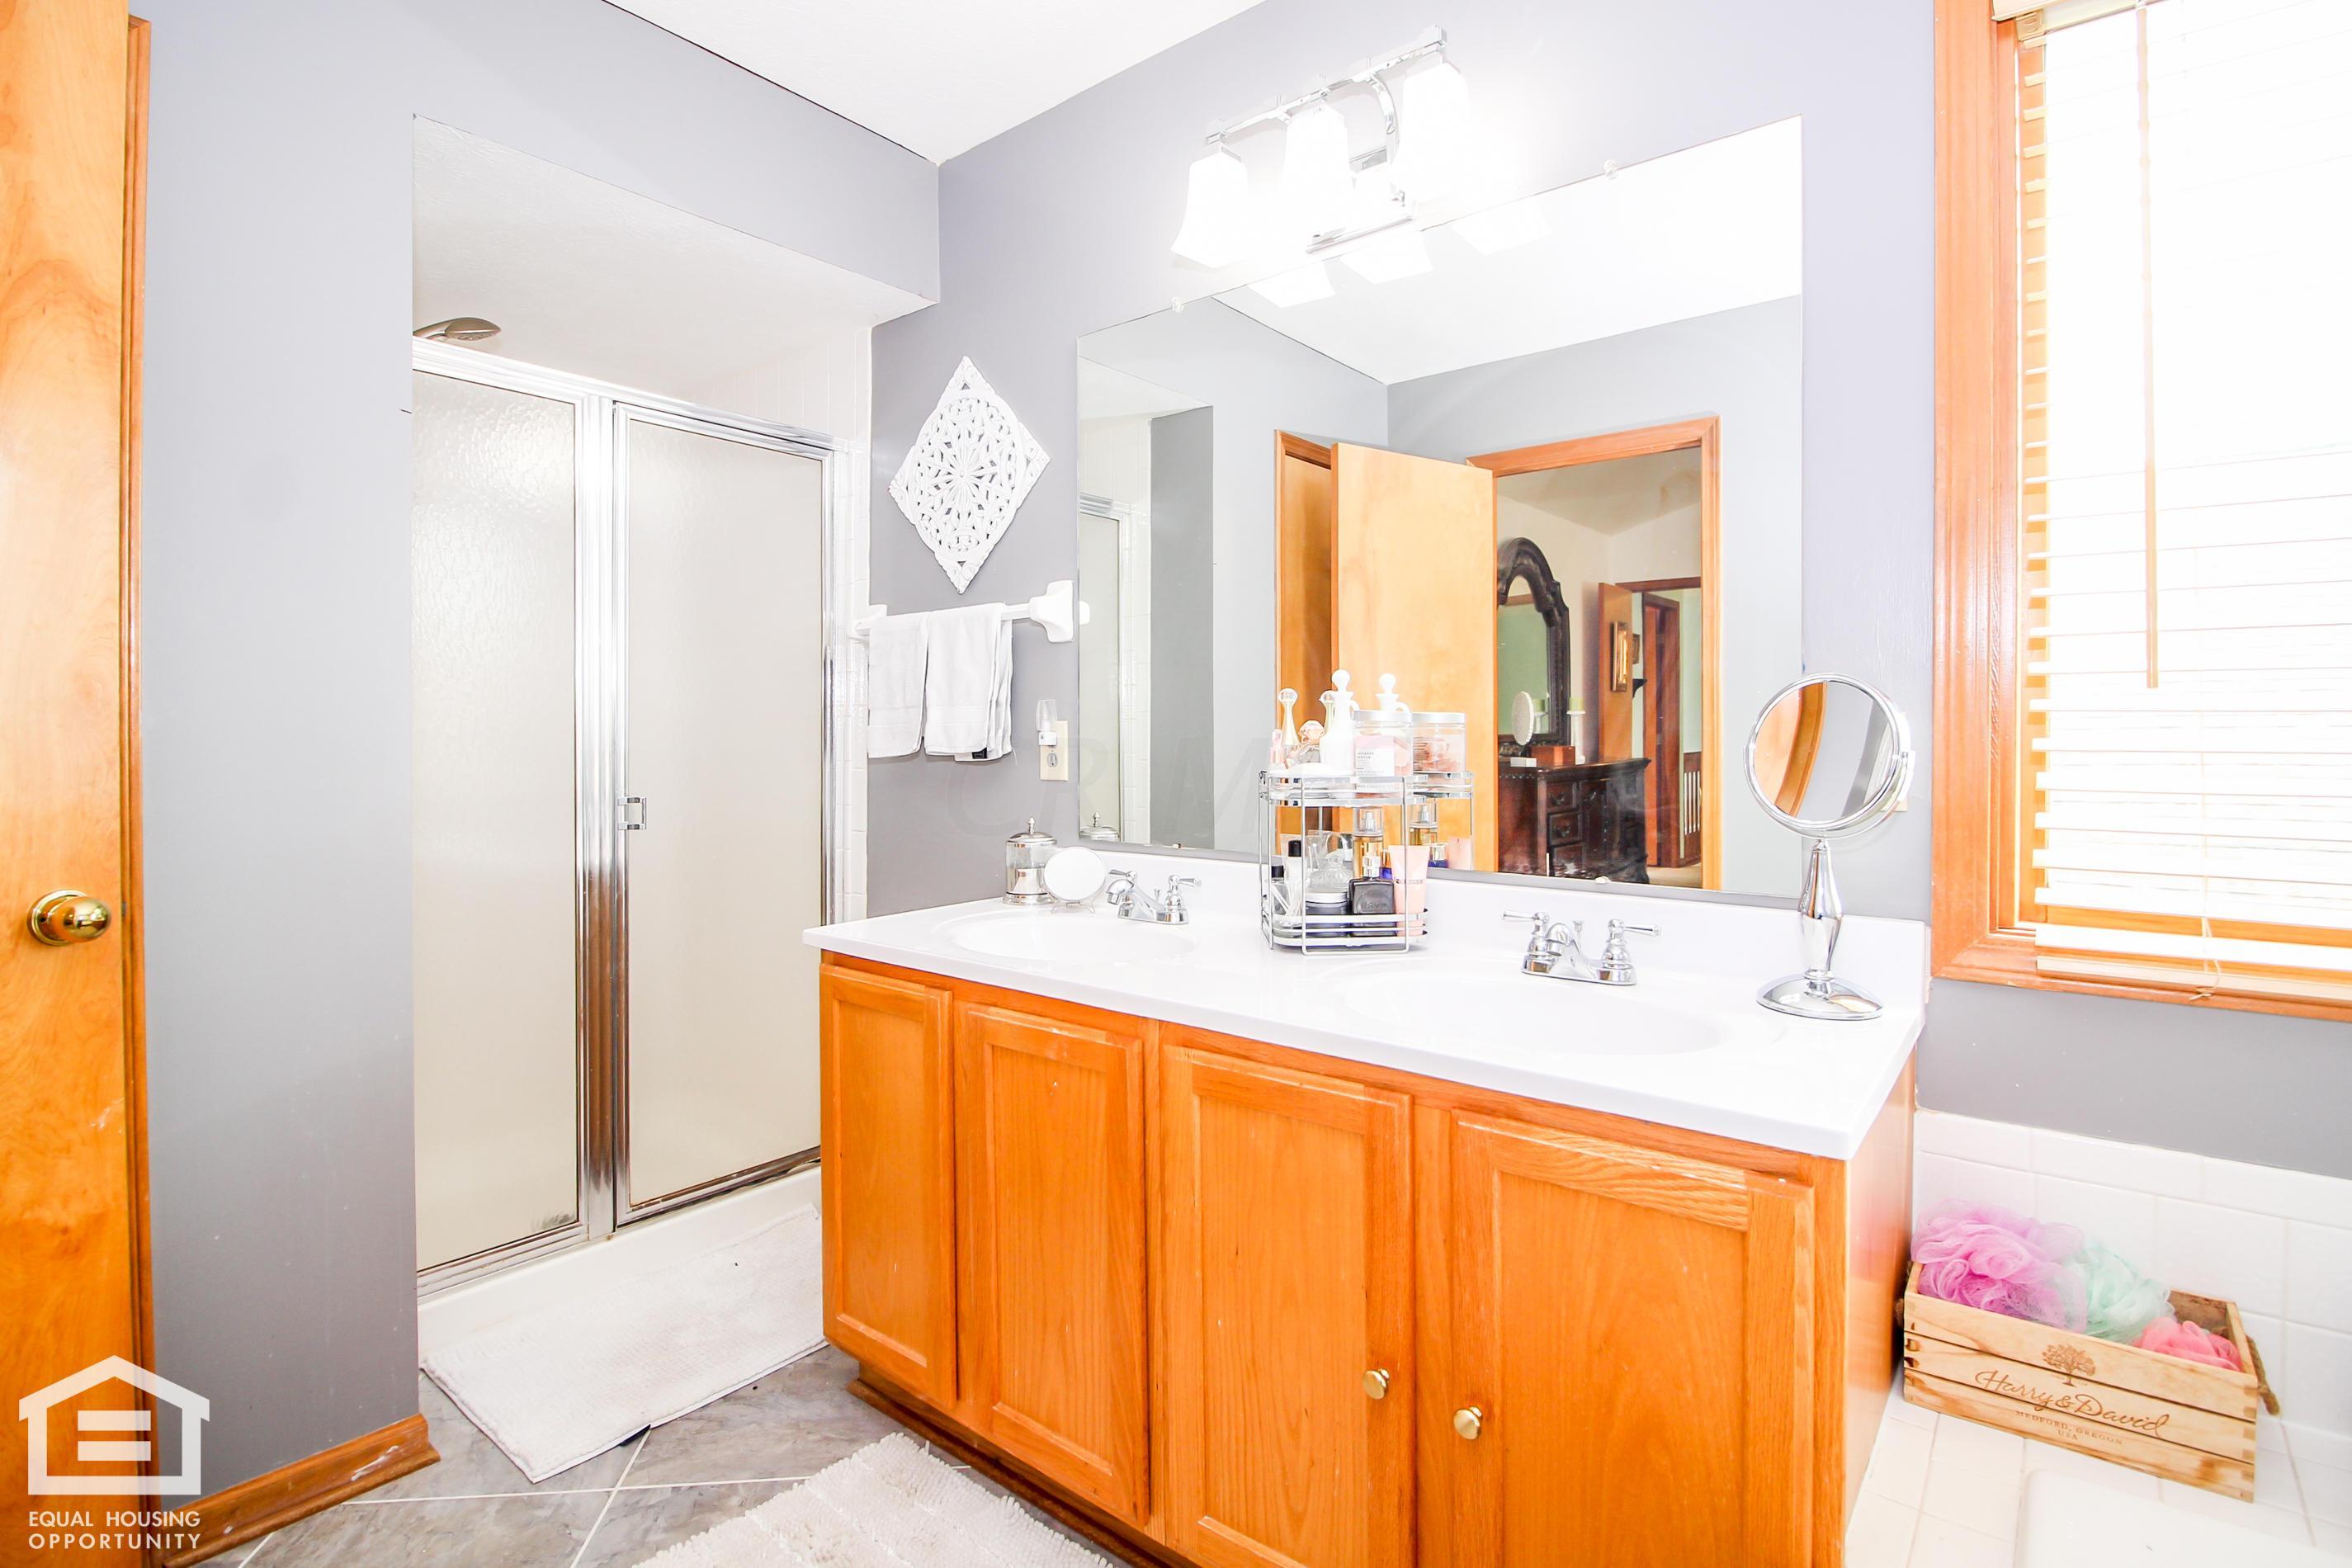 6145 Glenworth Court, Galloway, Ohio 43119, 4 Bedrooms Bedrooms, ,3 BathroomsBathrooms,Residential,For Sale,Glenworth,220031679